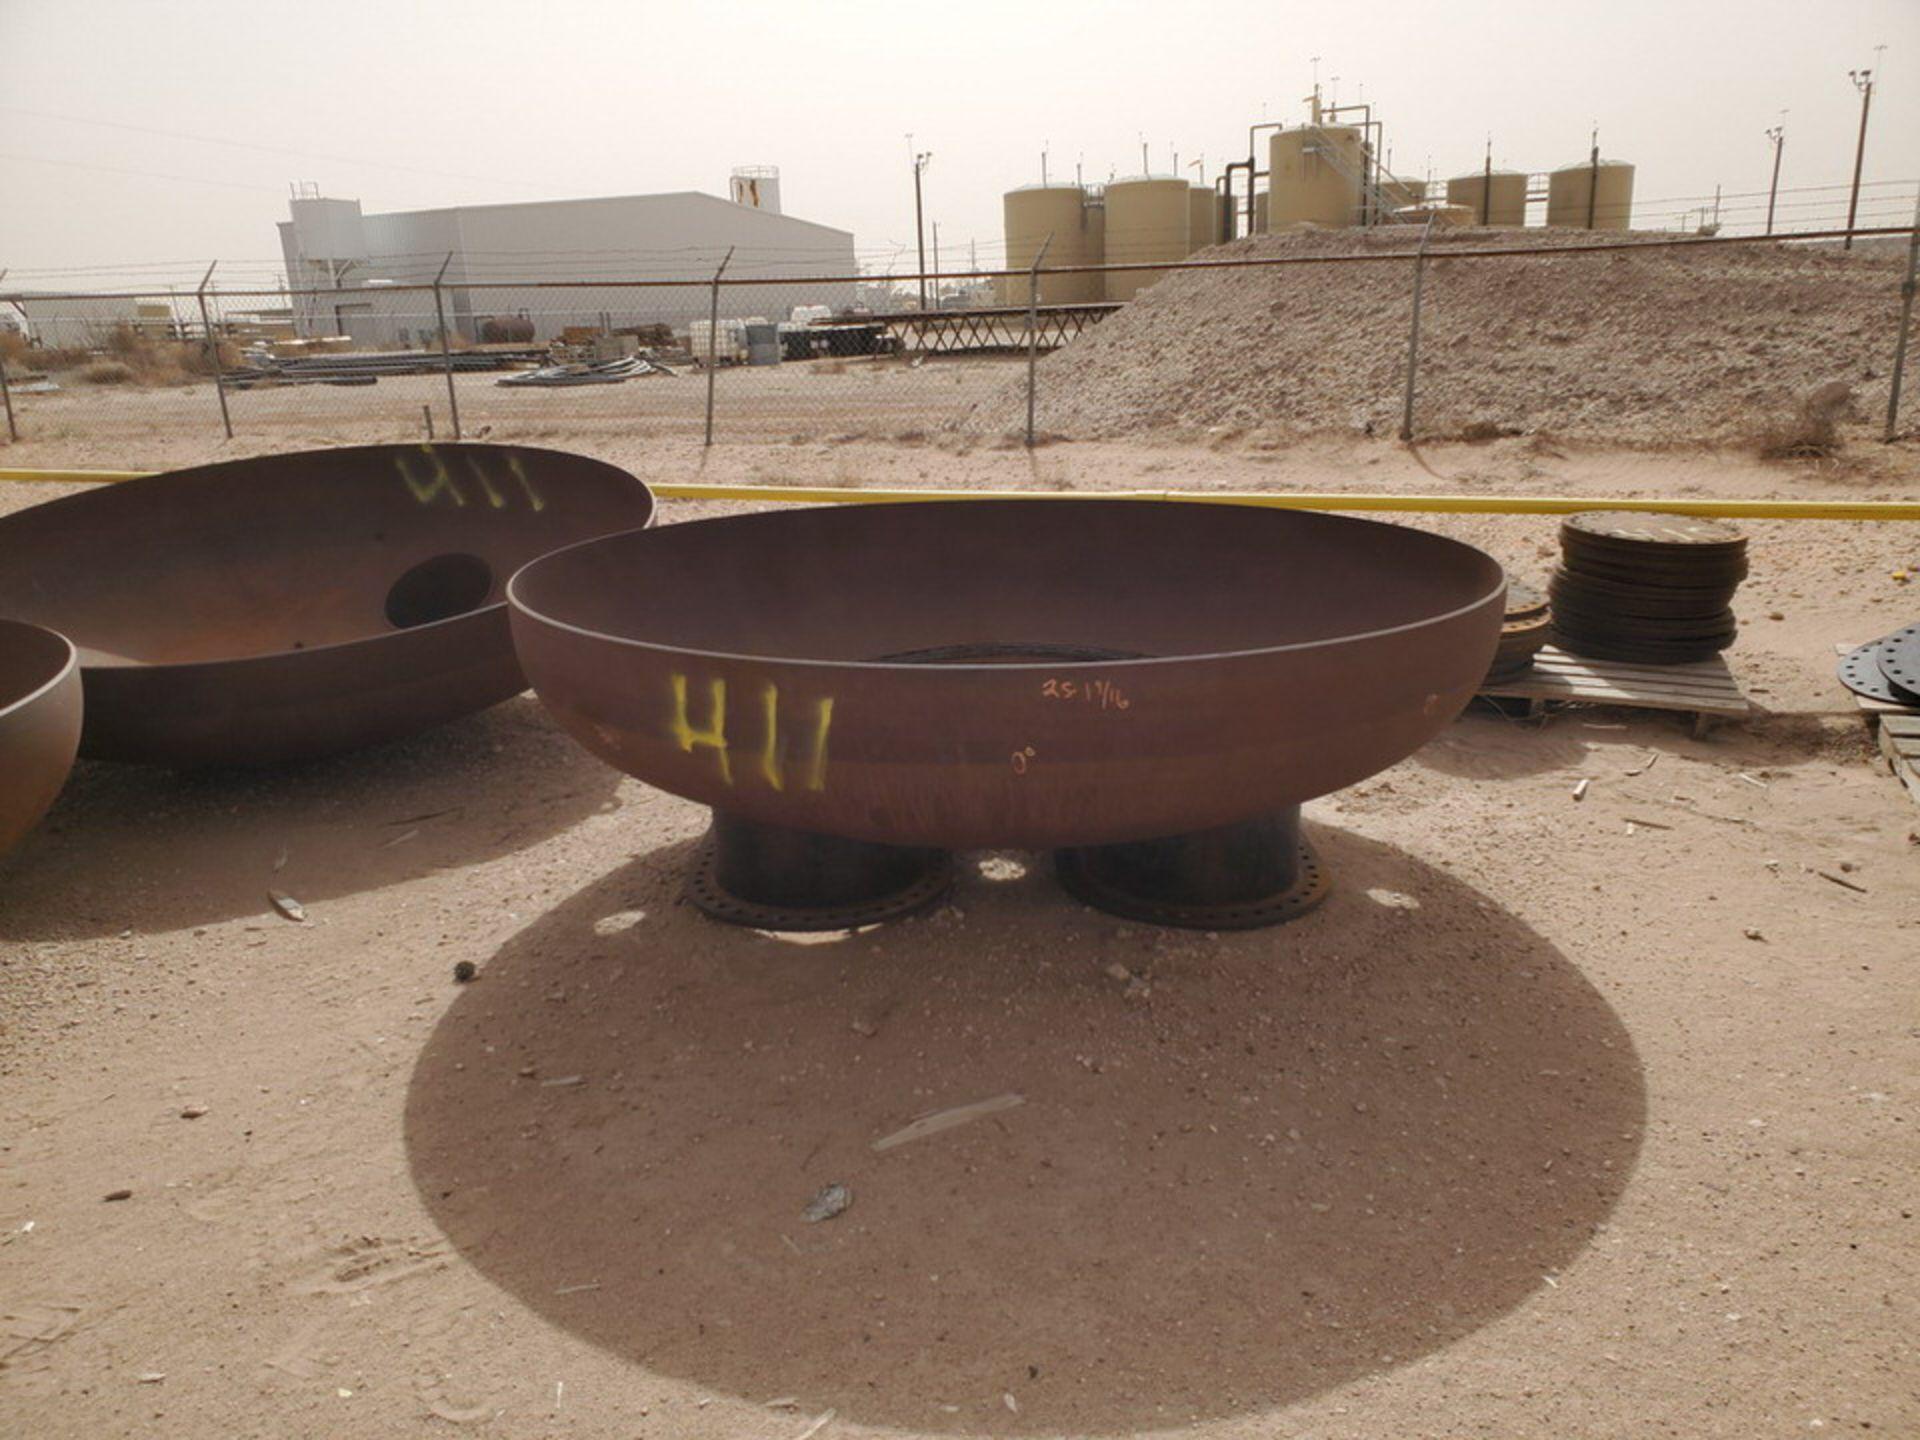 Tank Heads 8' O.D. - Image 2 of 14